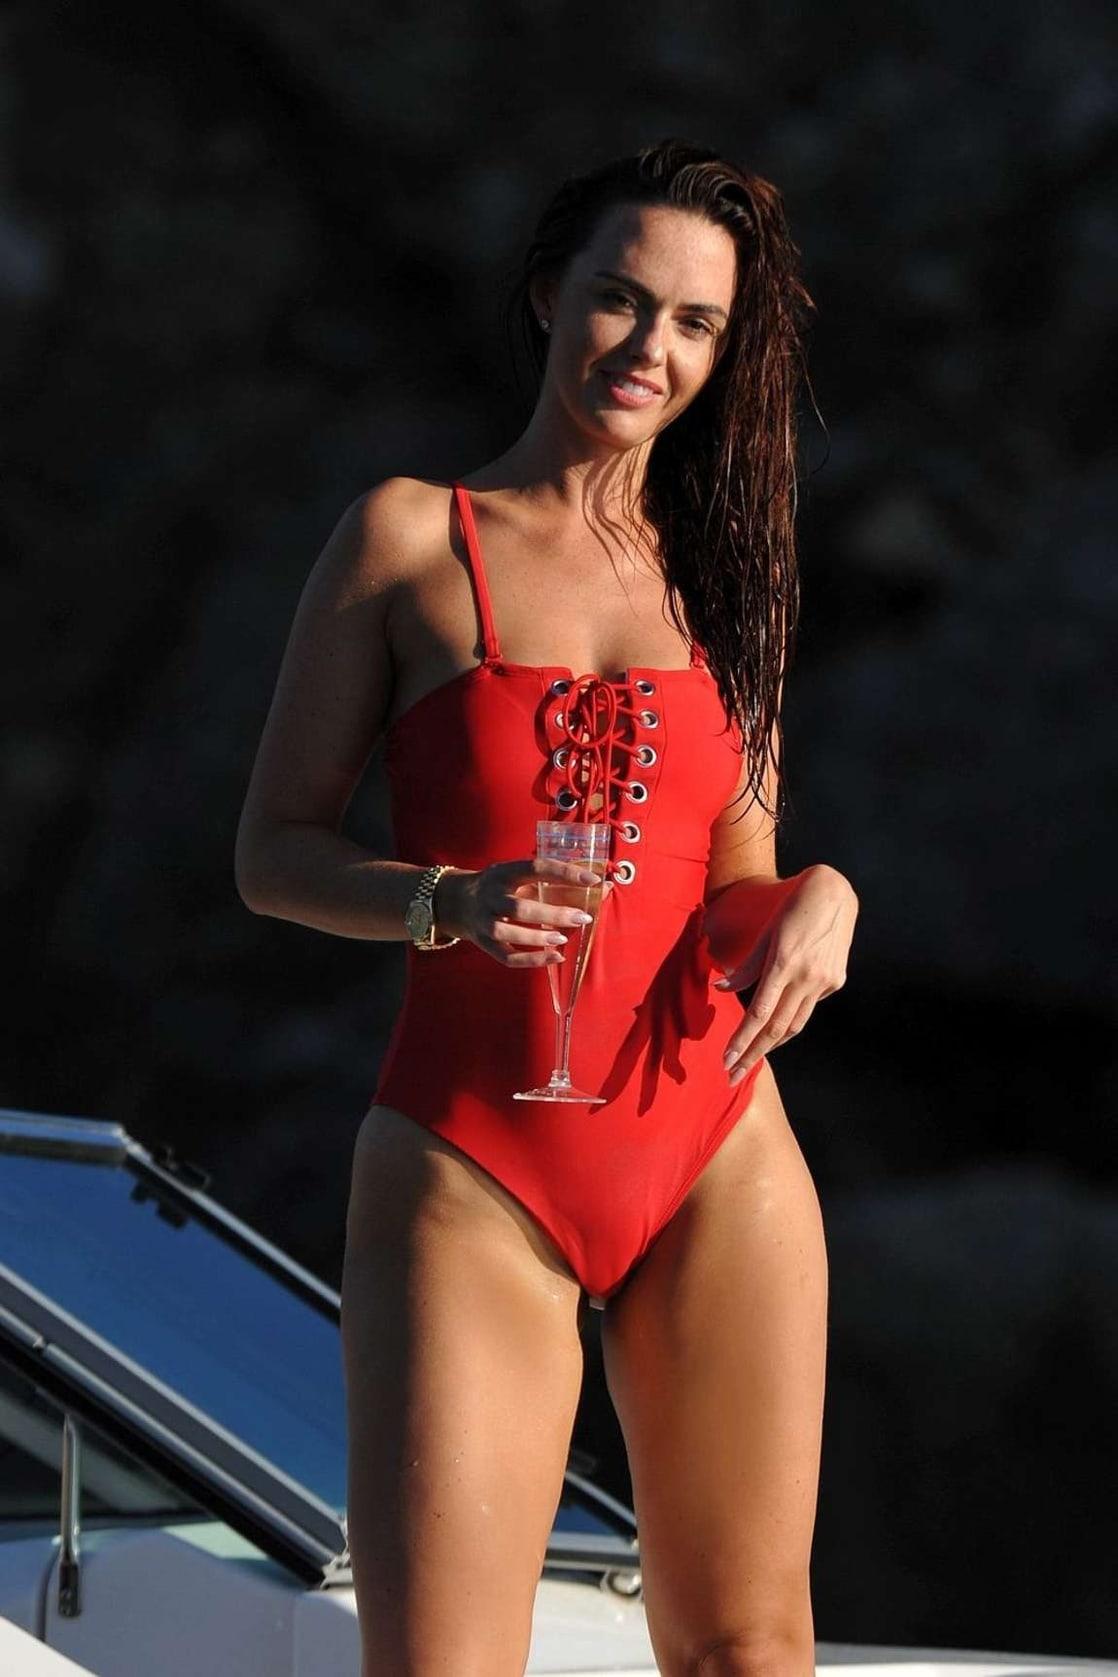 nude (98 photo), Ass Celebrity photos